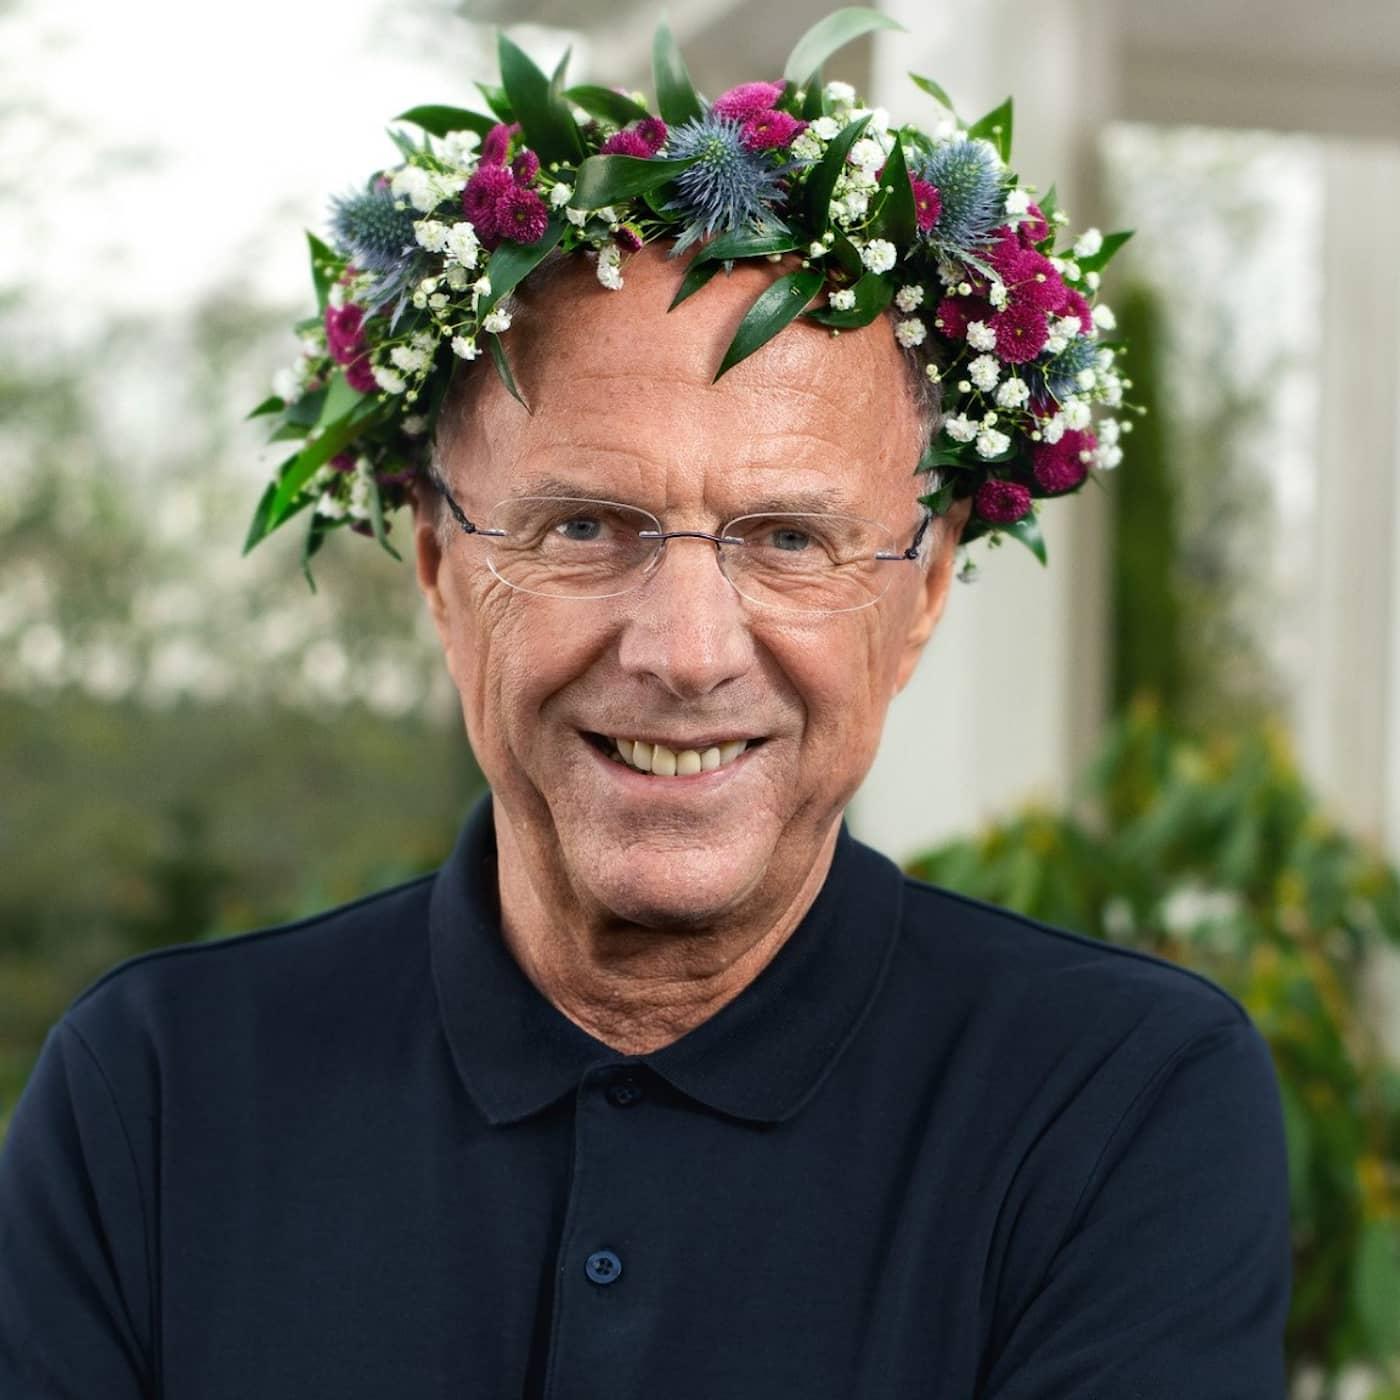 Sven–Göran Eriksson